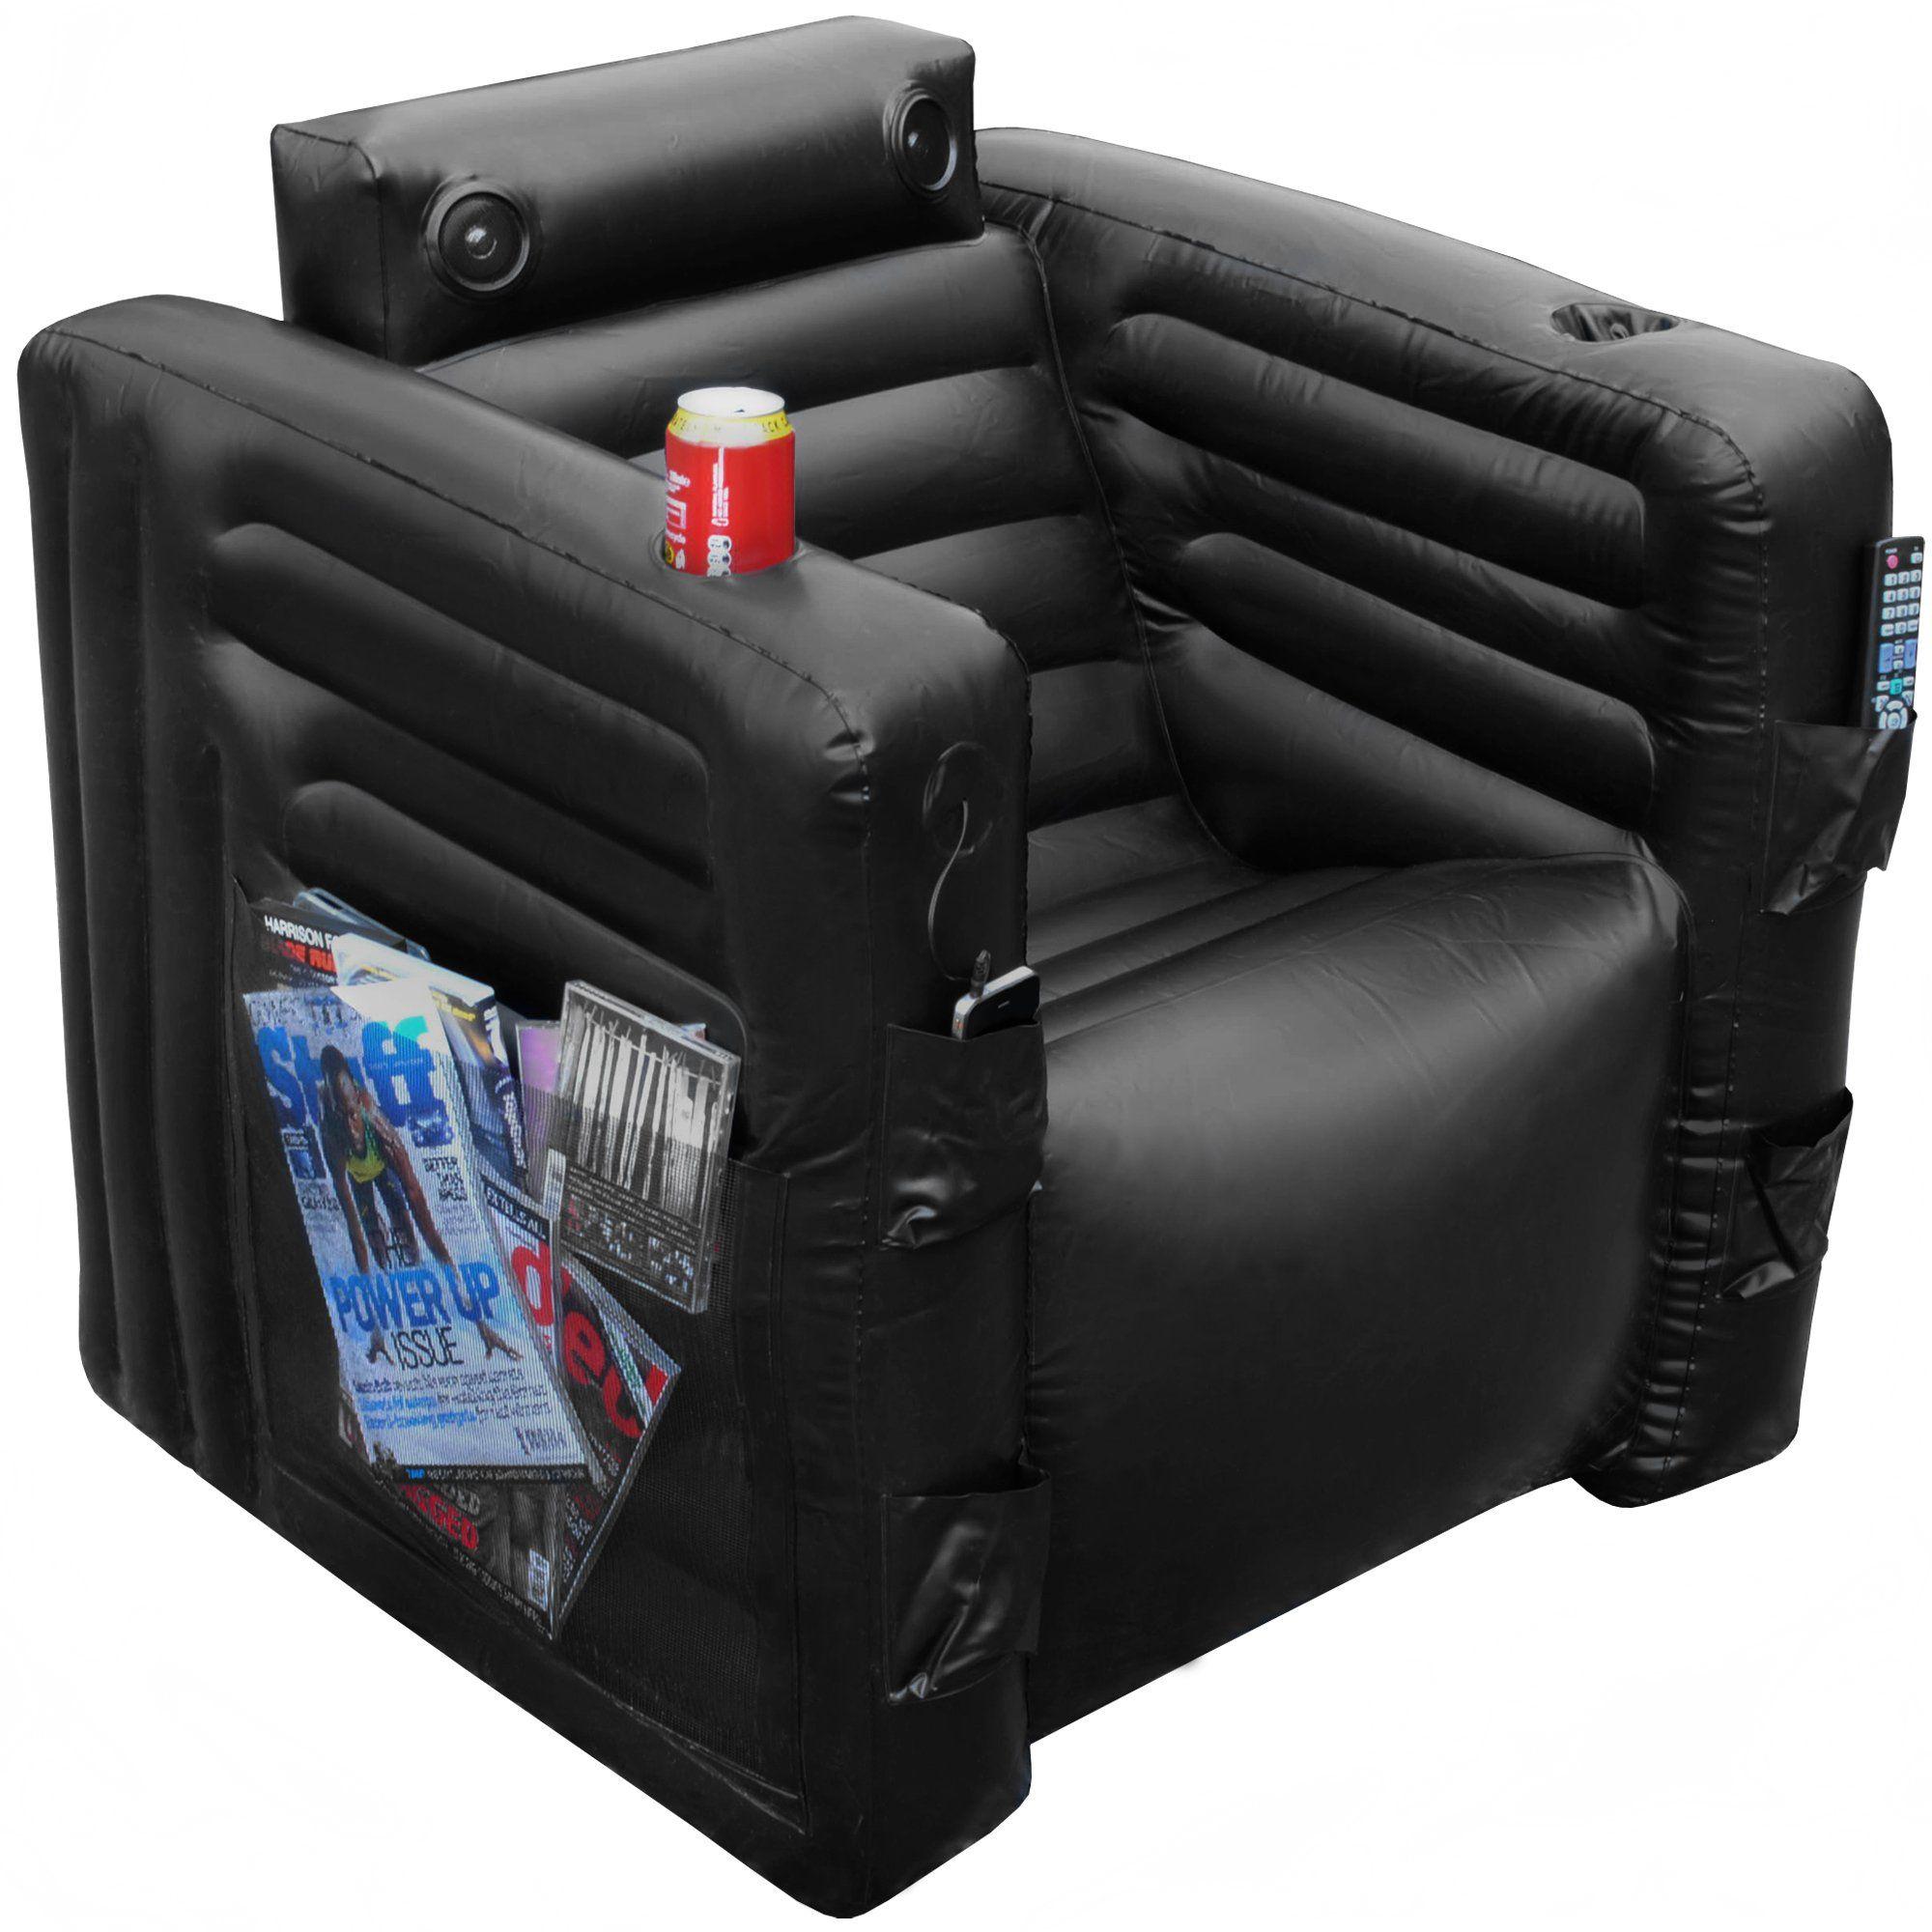 BBTradesales Inflatable Gadget Chair, Black Inflatable